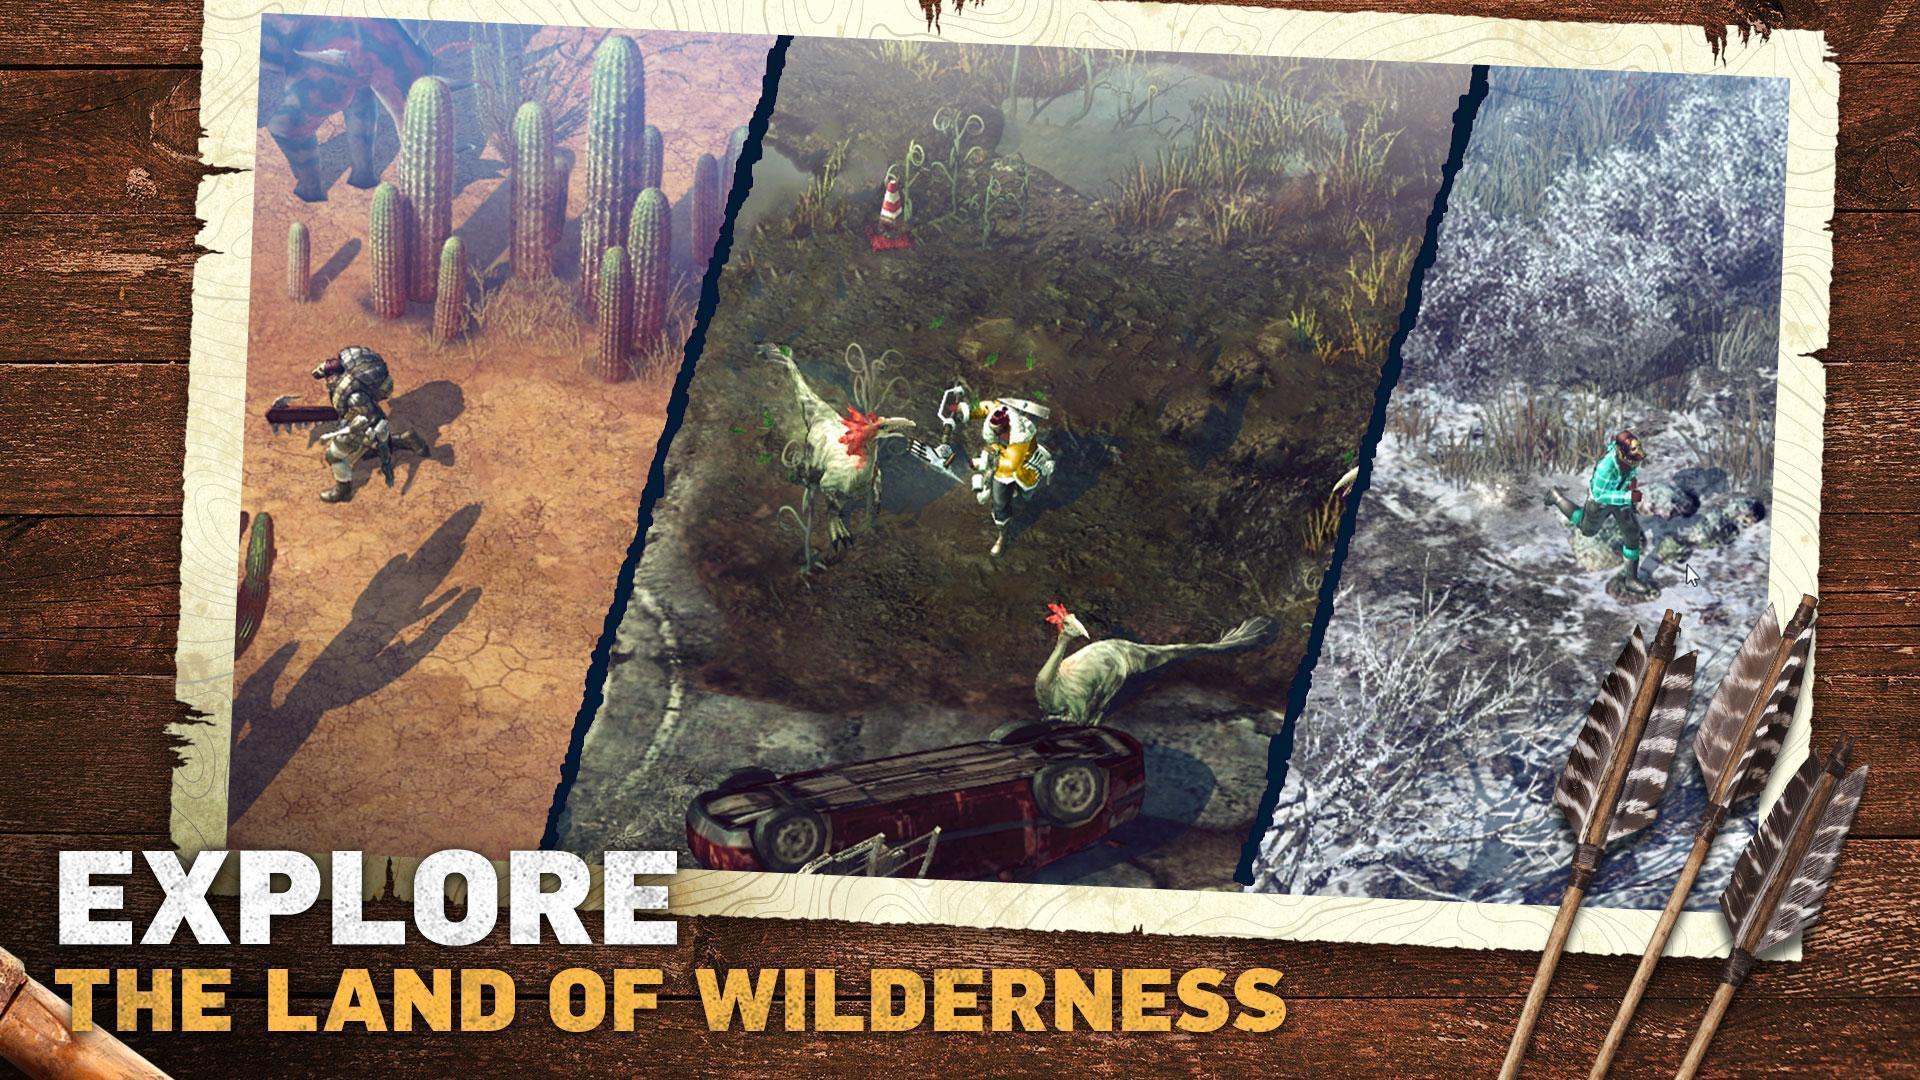 Durango: Wild Lands 5.1.1+1912061543 Screenshot 12